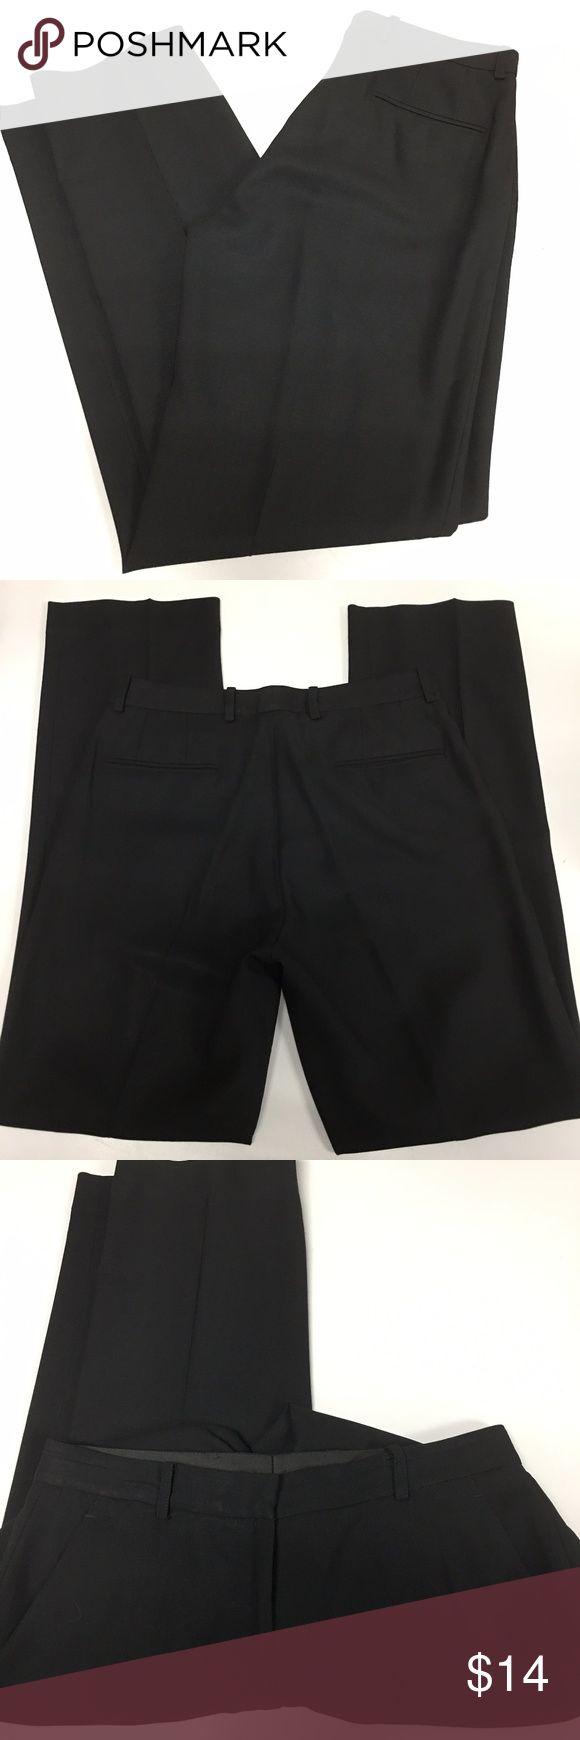 "DKNY Dress Pants Straight Trousers Career Black 6 Good Used Condition!  Brand - DKNY Size - 6 Material - 100% Wool  waist - 14.5"" rise - 10"" bottom leg width - 8"" inseam - 33"" Dkny Pants Straight Leg"